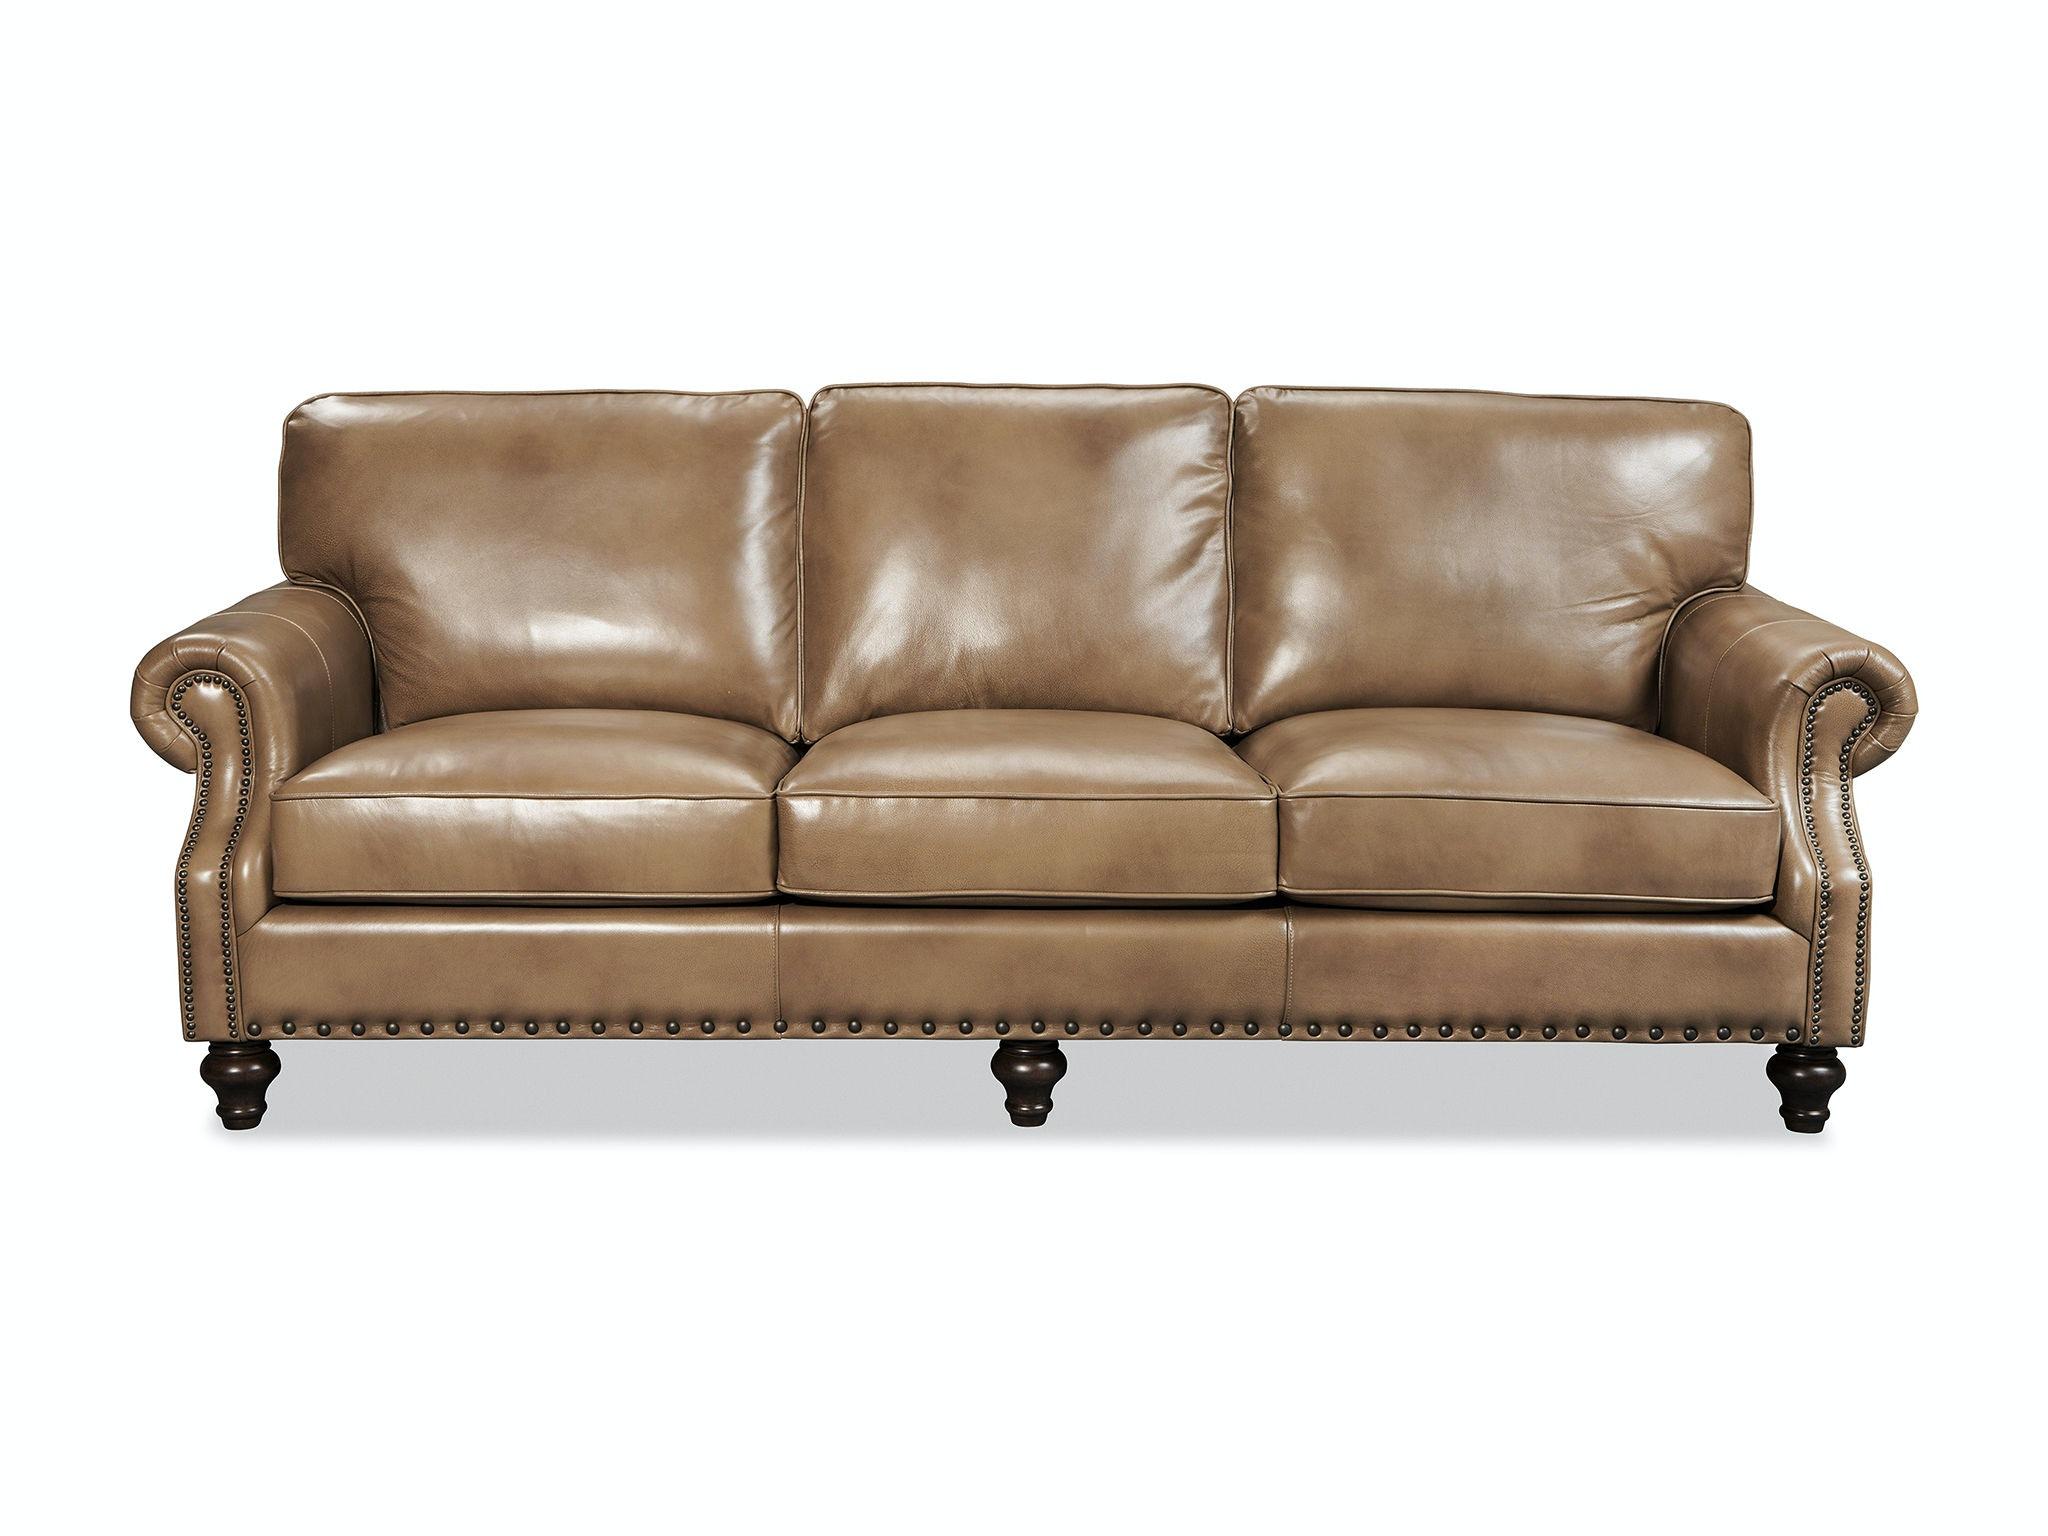 Craftmaster Living Room Sofa L171450 At Kiser Furniture